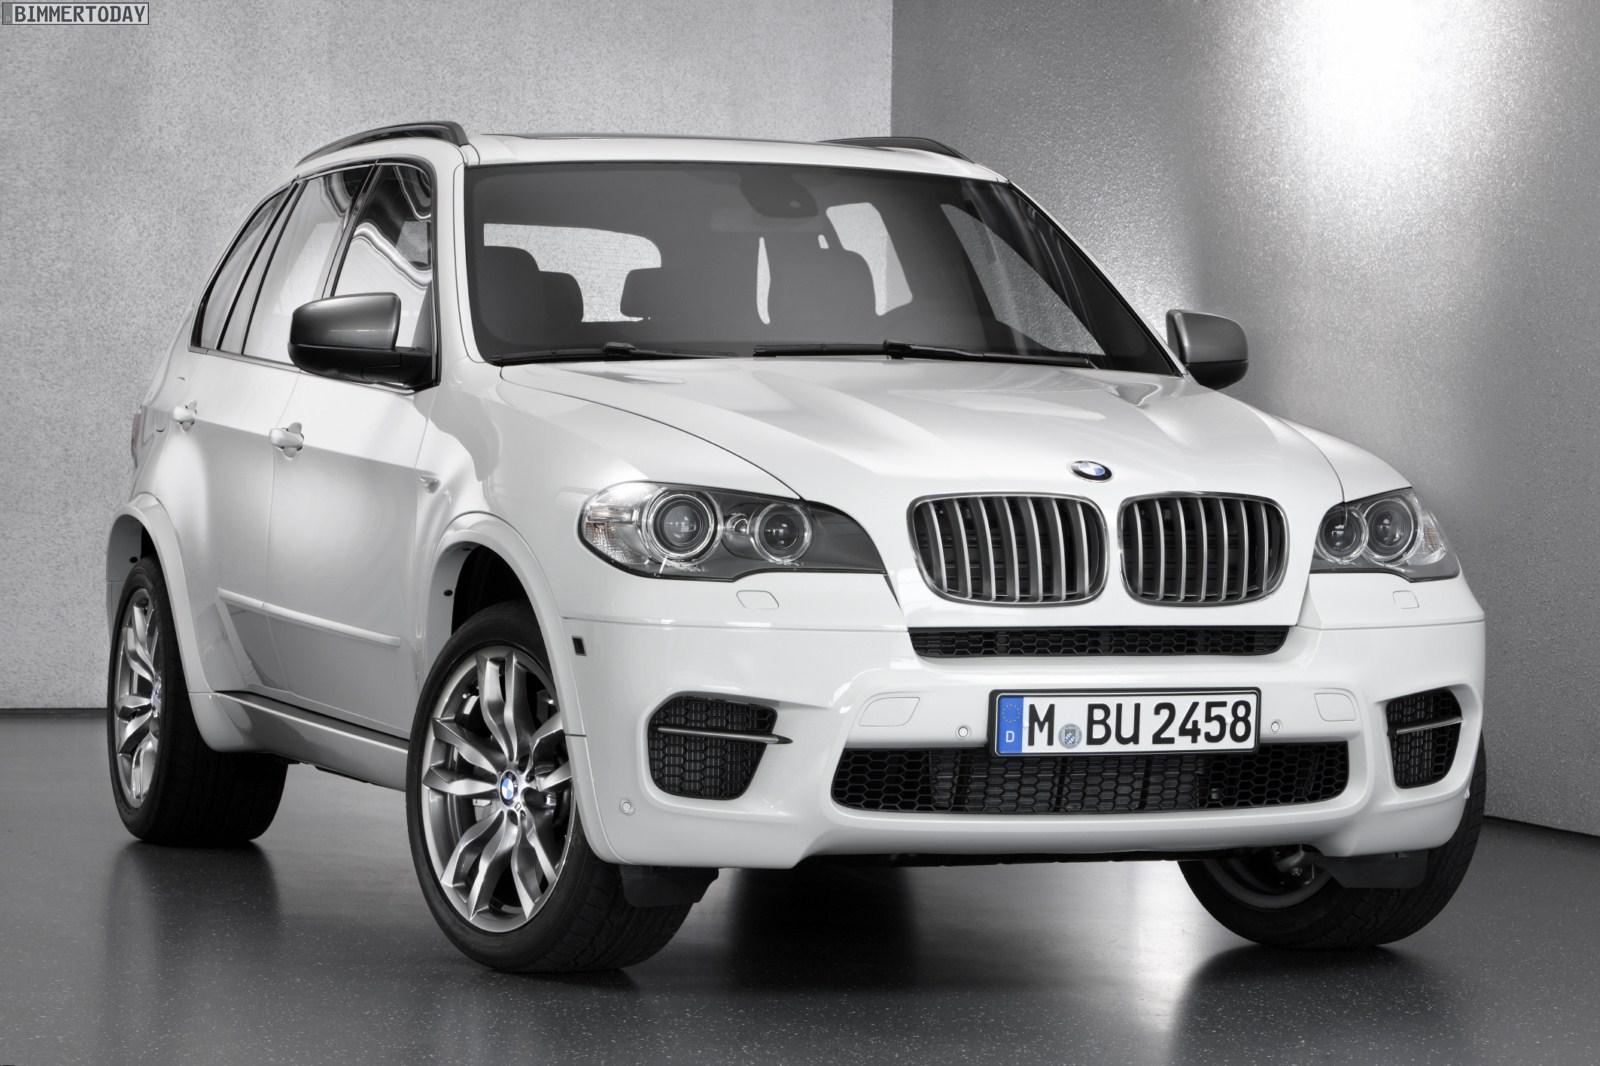 Vergleich Bmw X5 M50d Amp X6 M50d Vs Audi Q7 4 2 Tdi Und